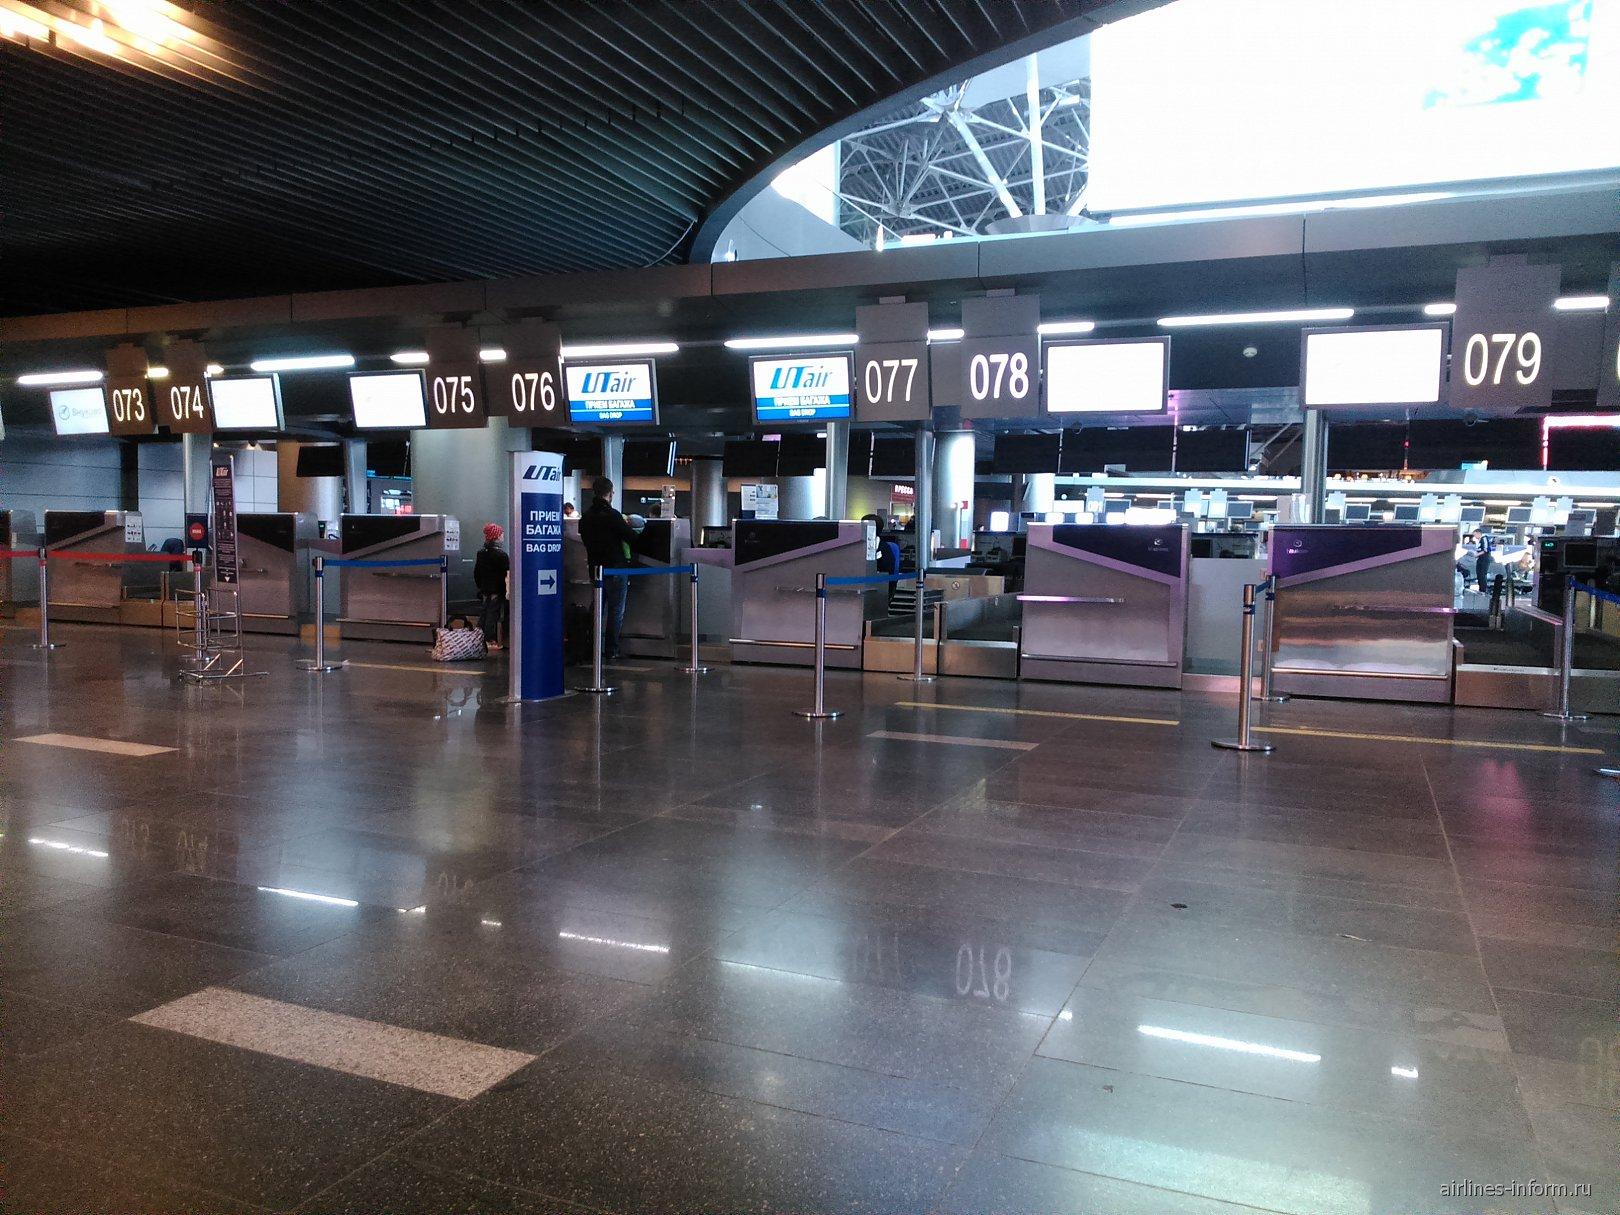 Стойки регистрации ЮТэйр в аэропорту Внуково